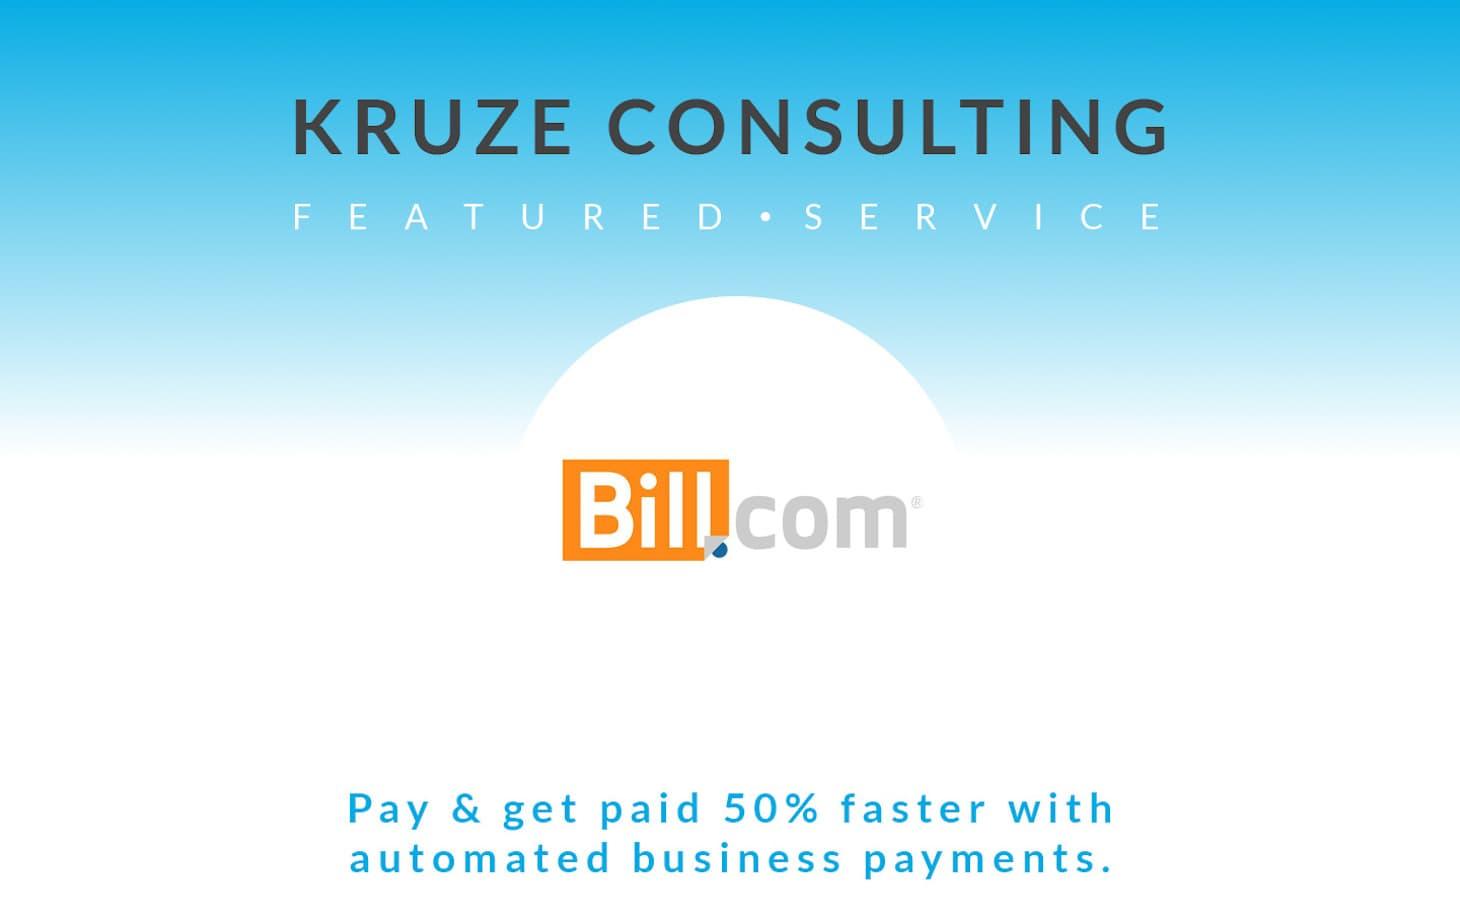 Featured Service - Bill.com